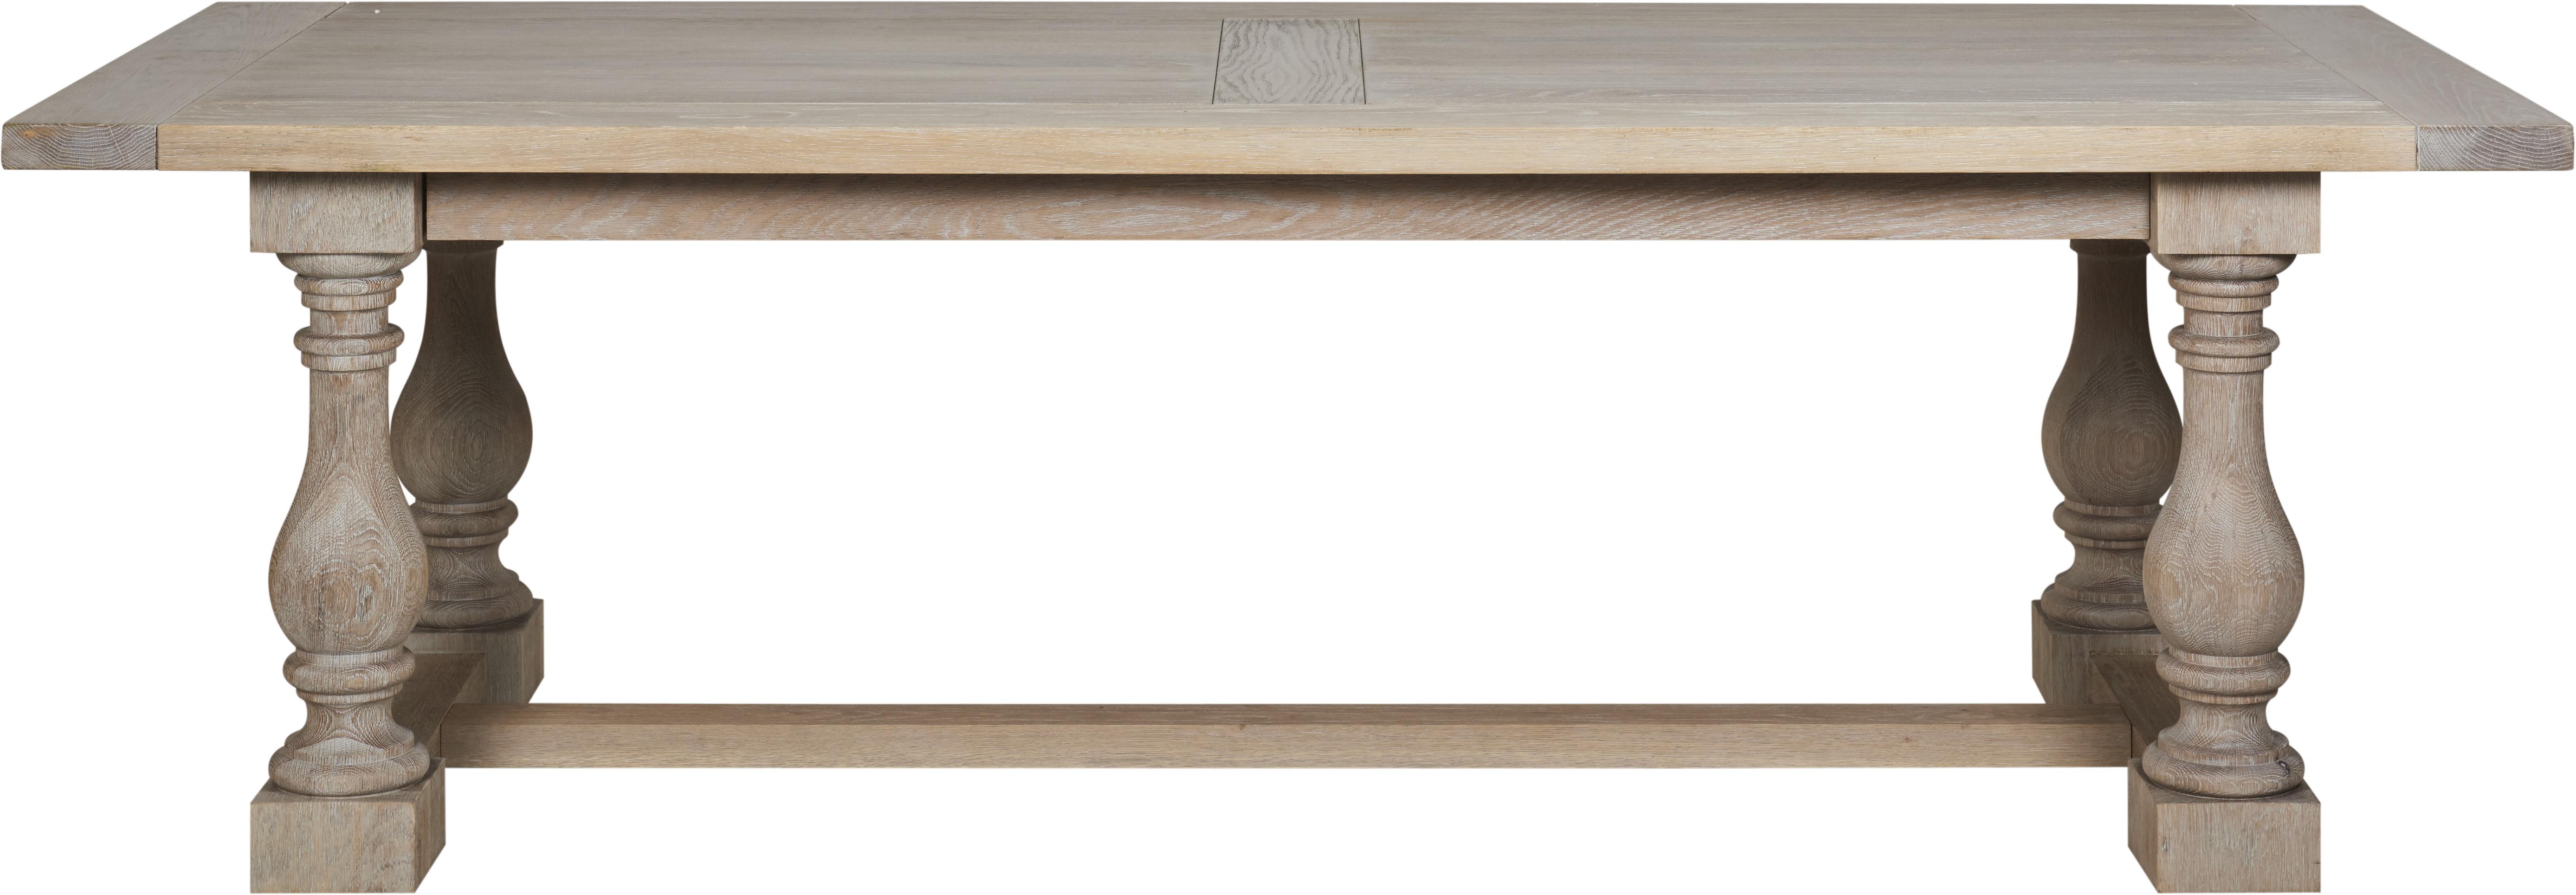 Balmoral Rectangular Dining Table